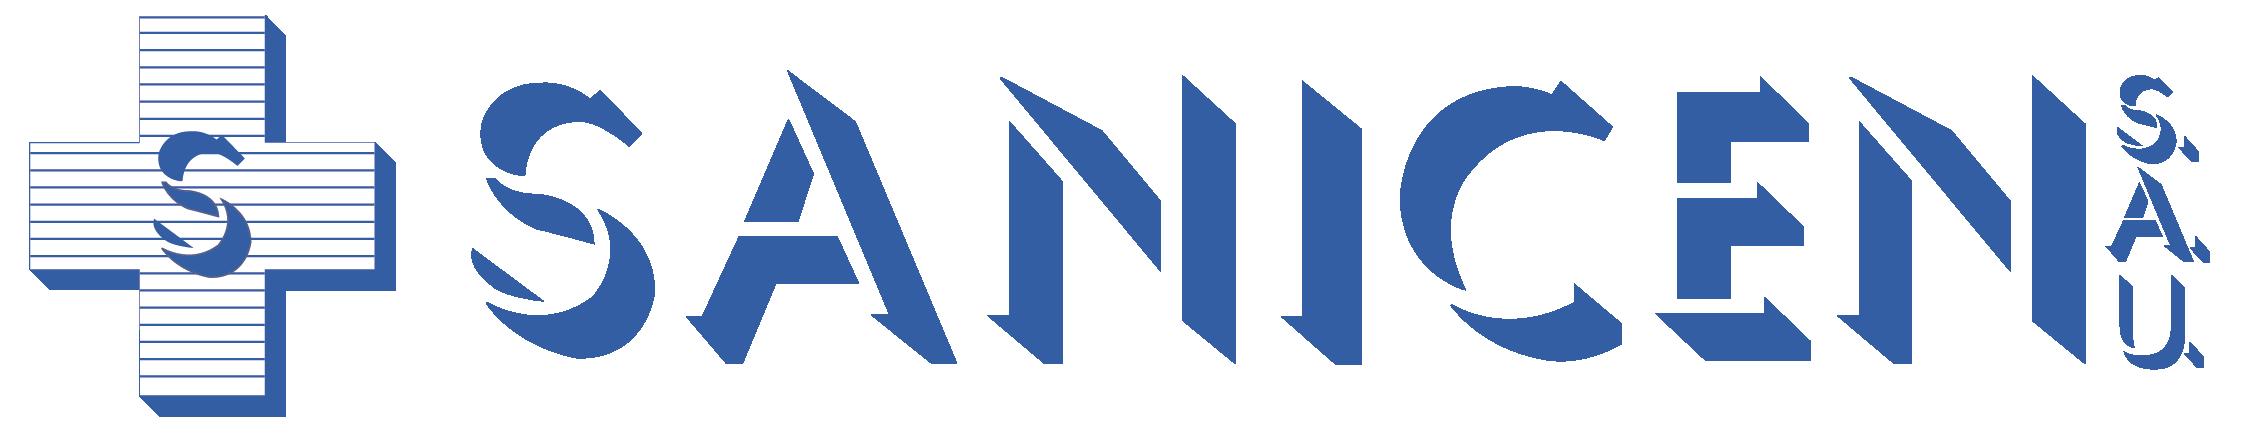 Sanicen